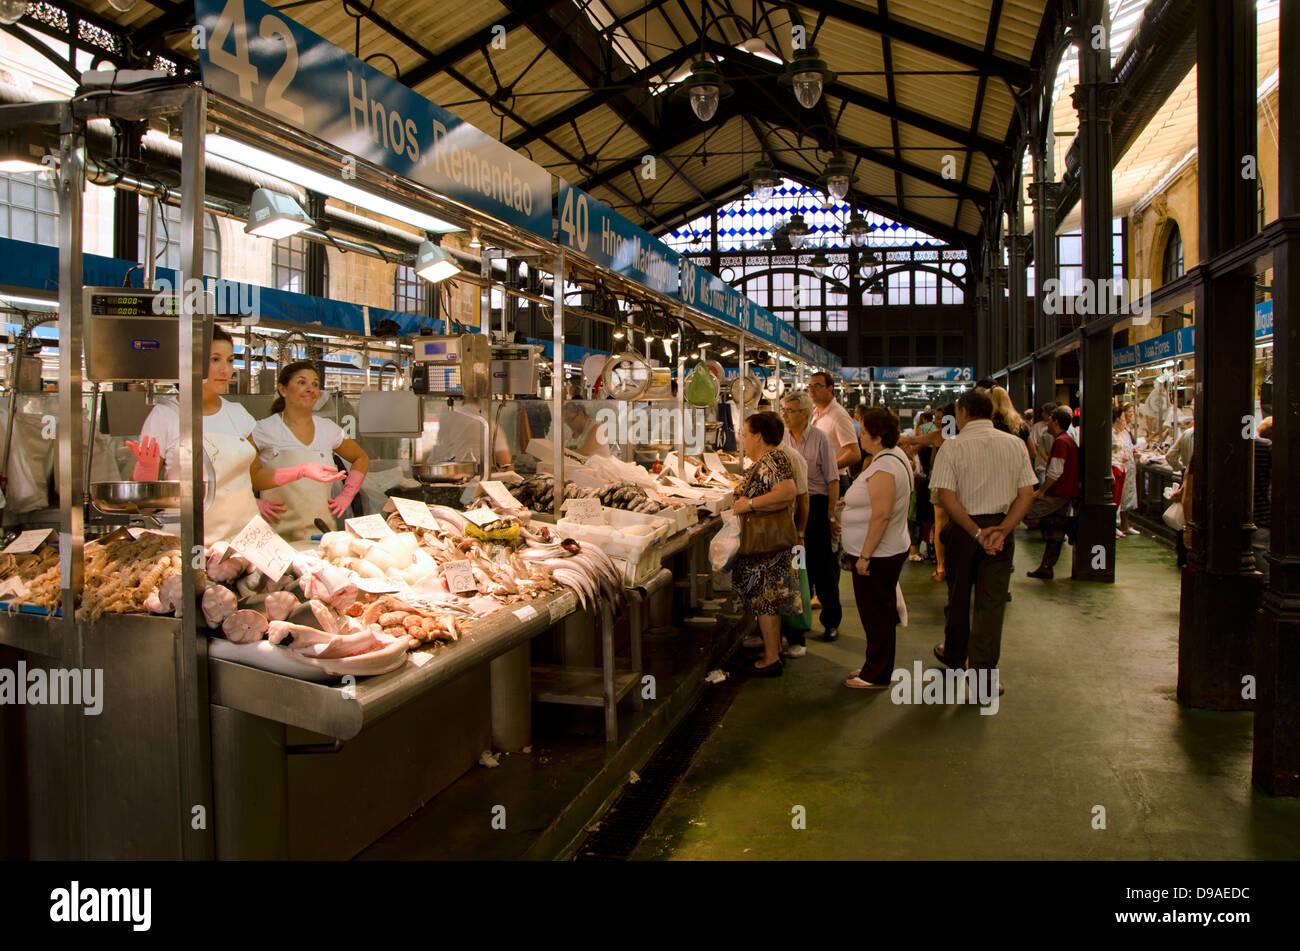 The mercado central de abastos covered fresh fish market for La fish market